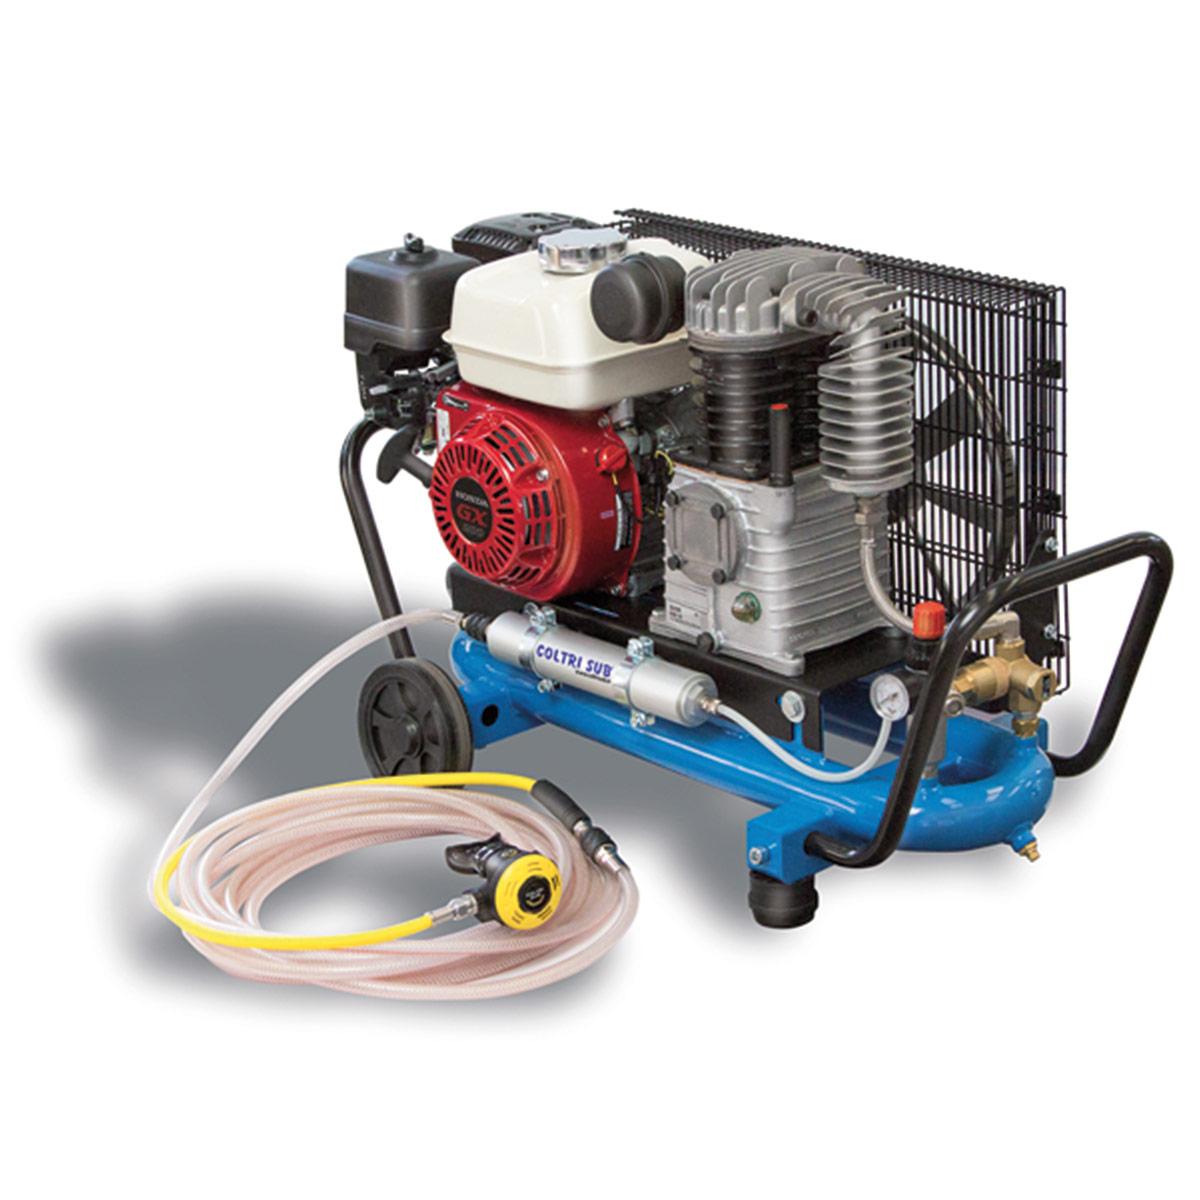 Бензинов водолазен компресор тип Наргеле ЕOLO 330 SH 8 бара / HONDA - Coltri